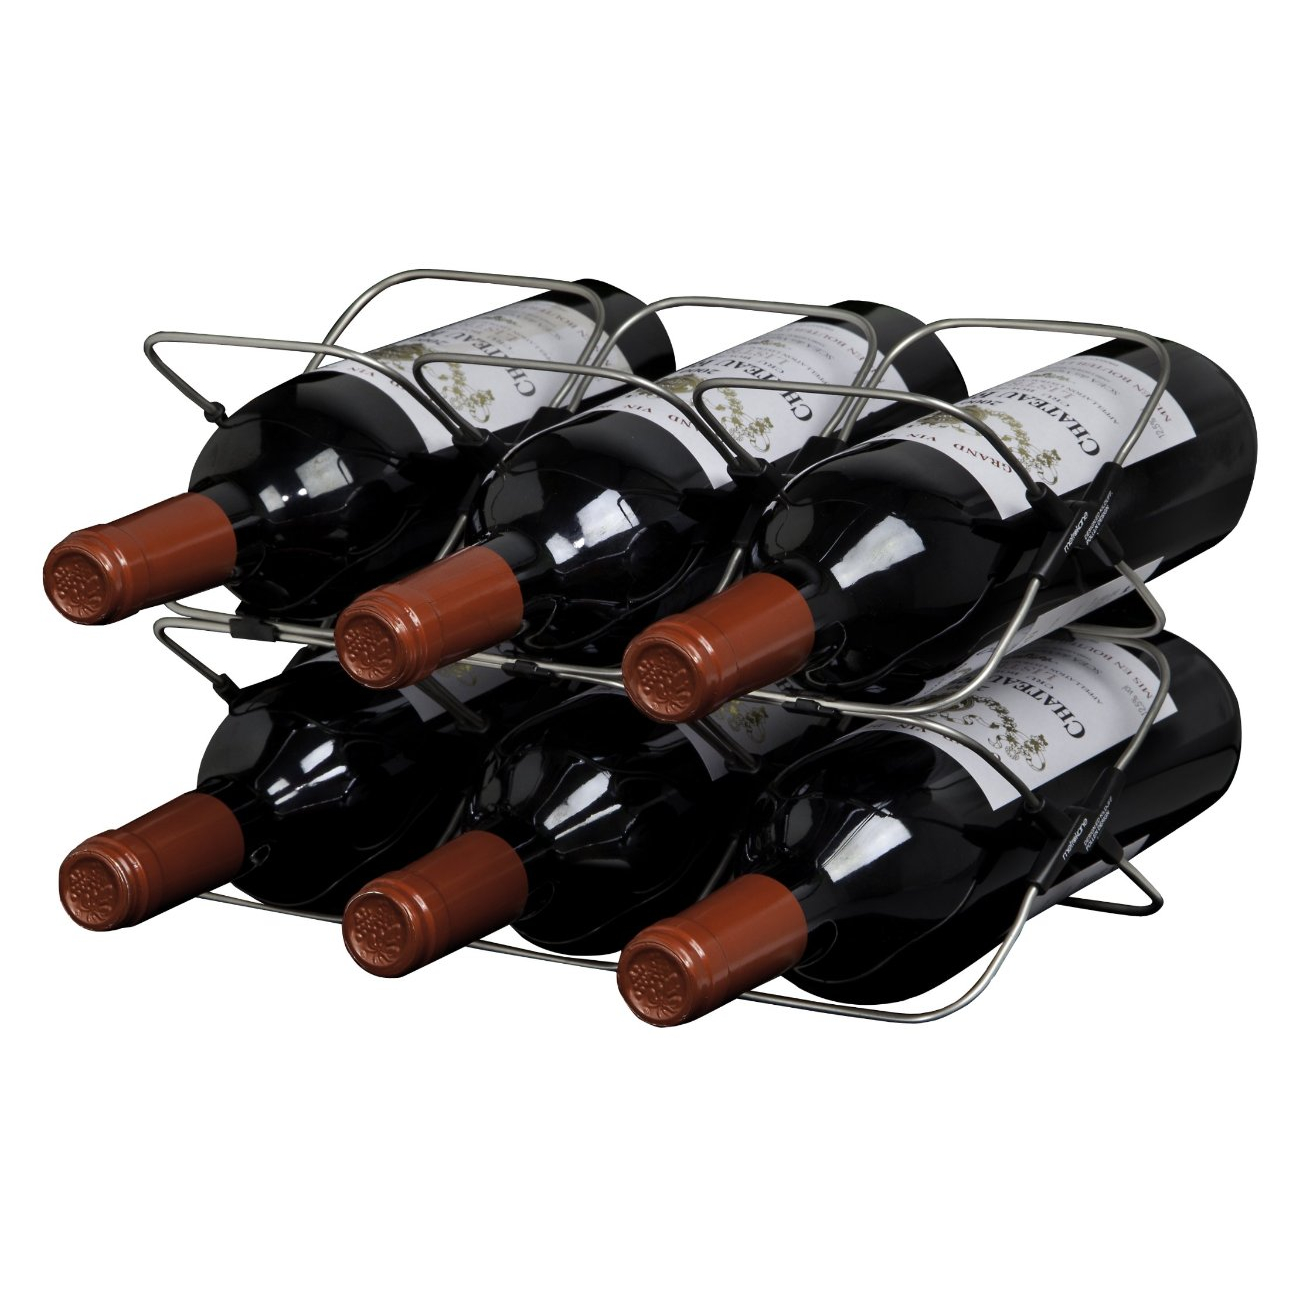 Rabbit 6-Bottle Space Saving Wine Rack